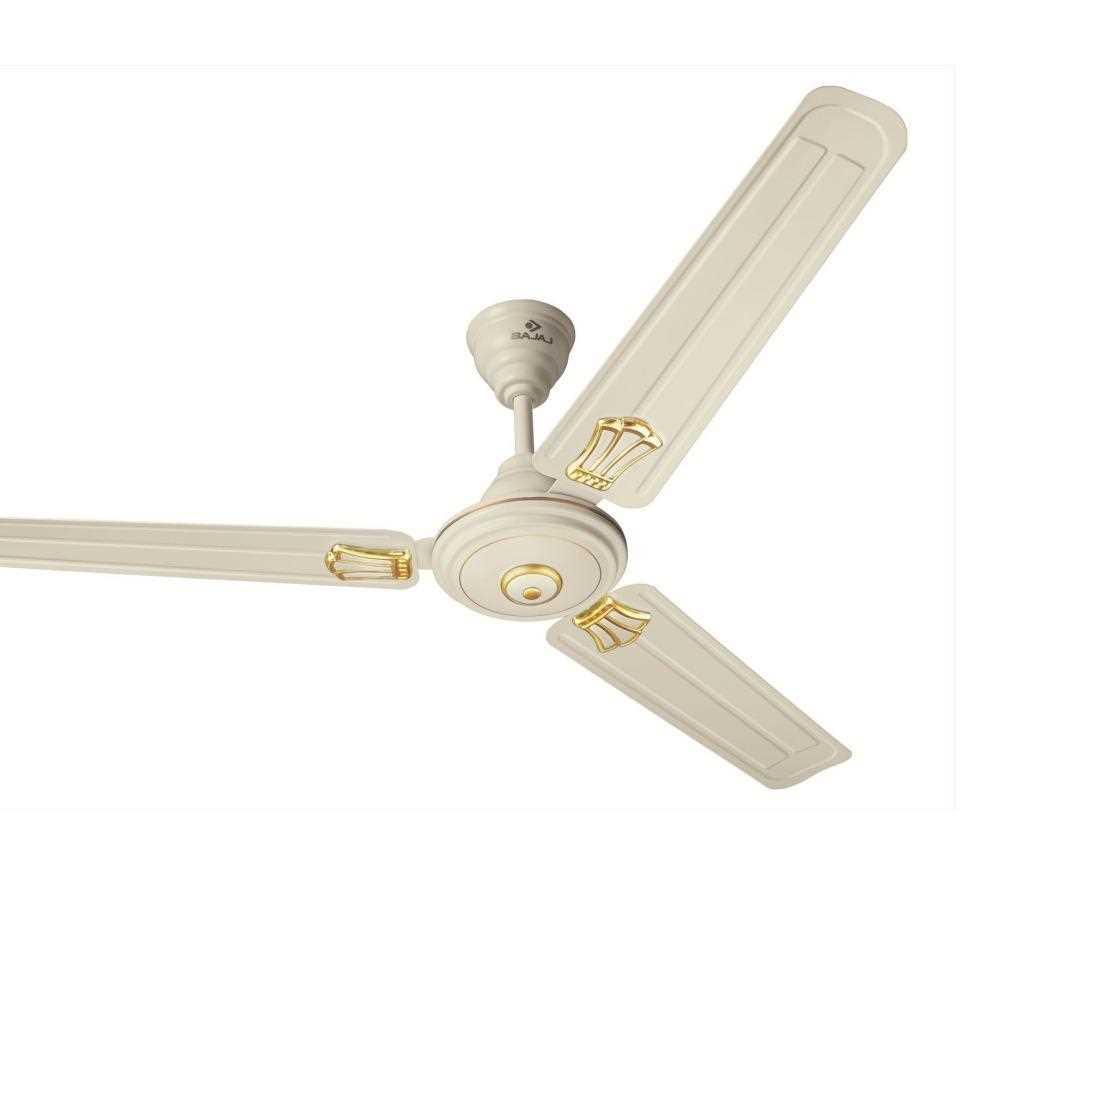 Bajaj Bahar Deco 1200 Mm 3 Blade Ceiling Fan Price 25 Nov 2020 Bahar Deco 1200 Mm Reviews And Specifications